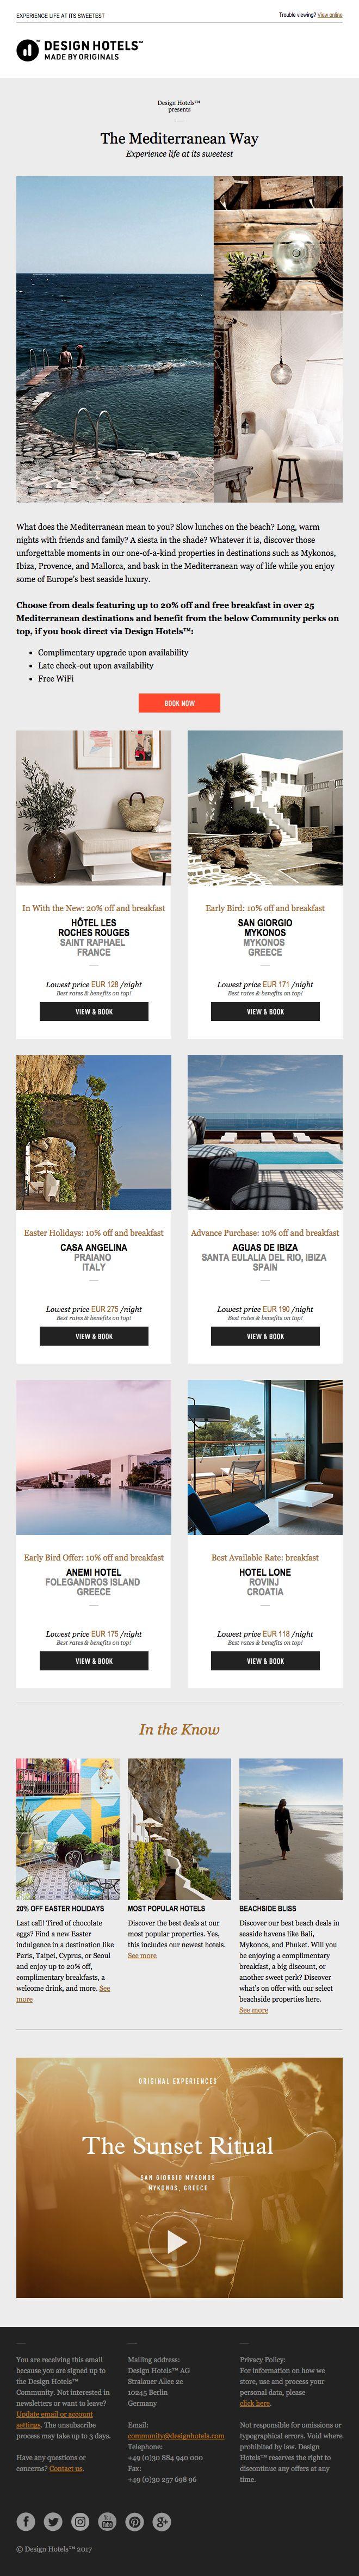 Design Hotels Newsletter 04.2017